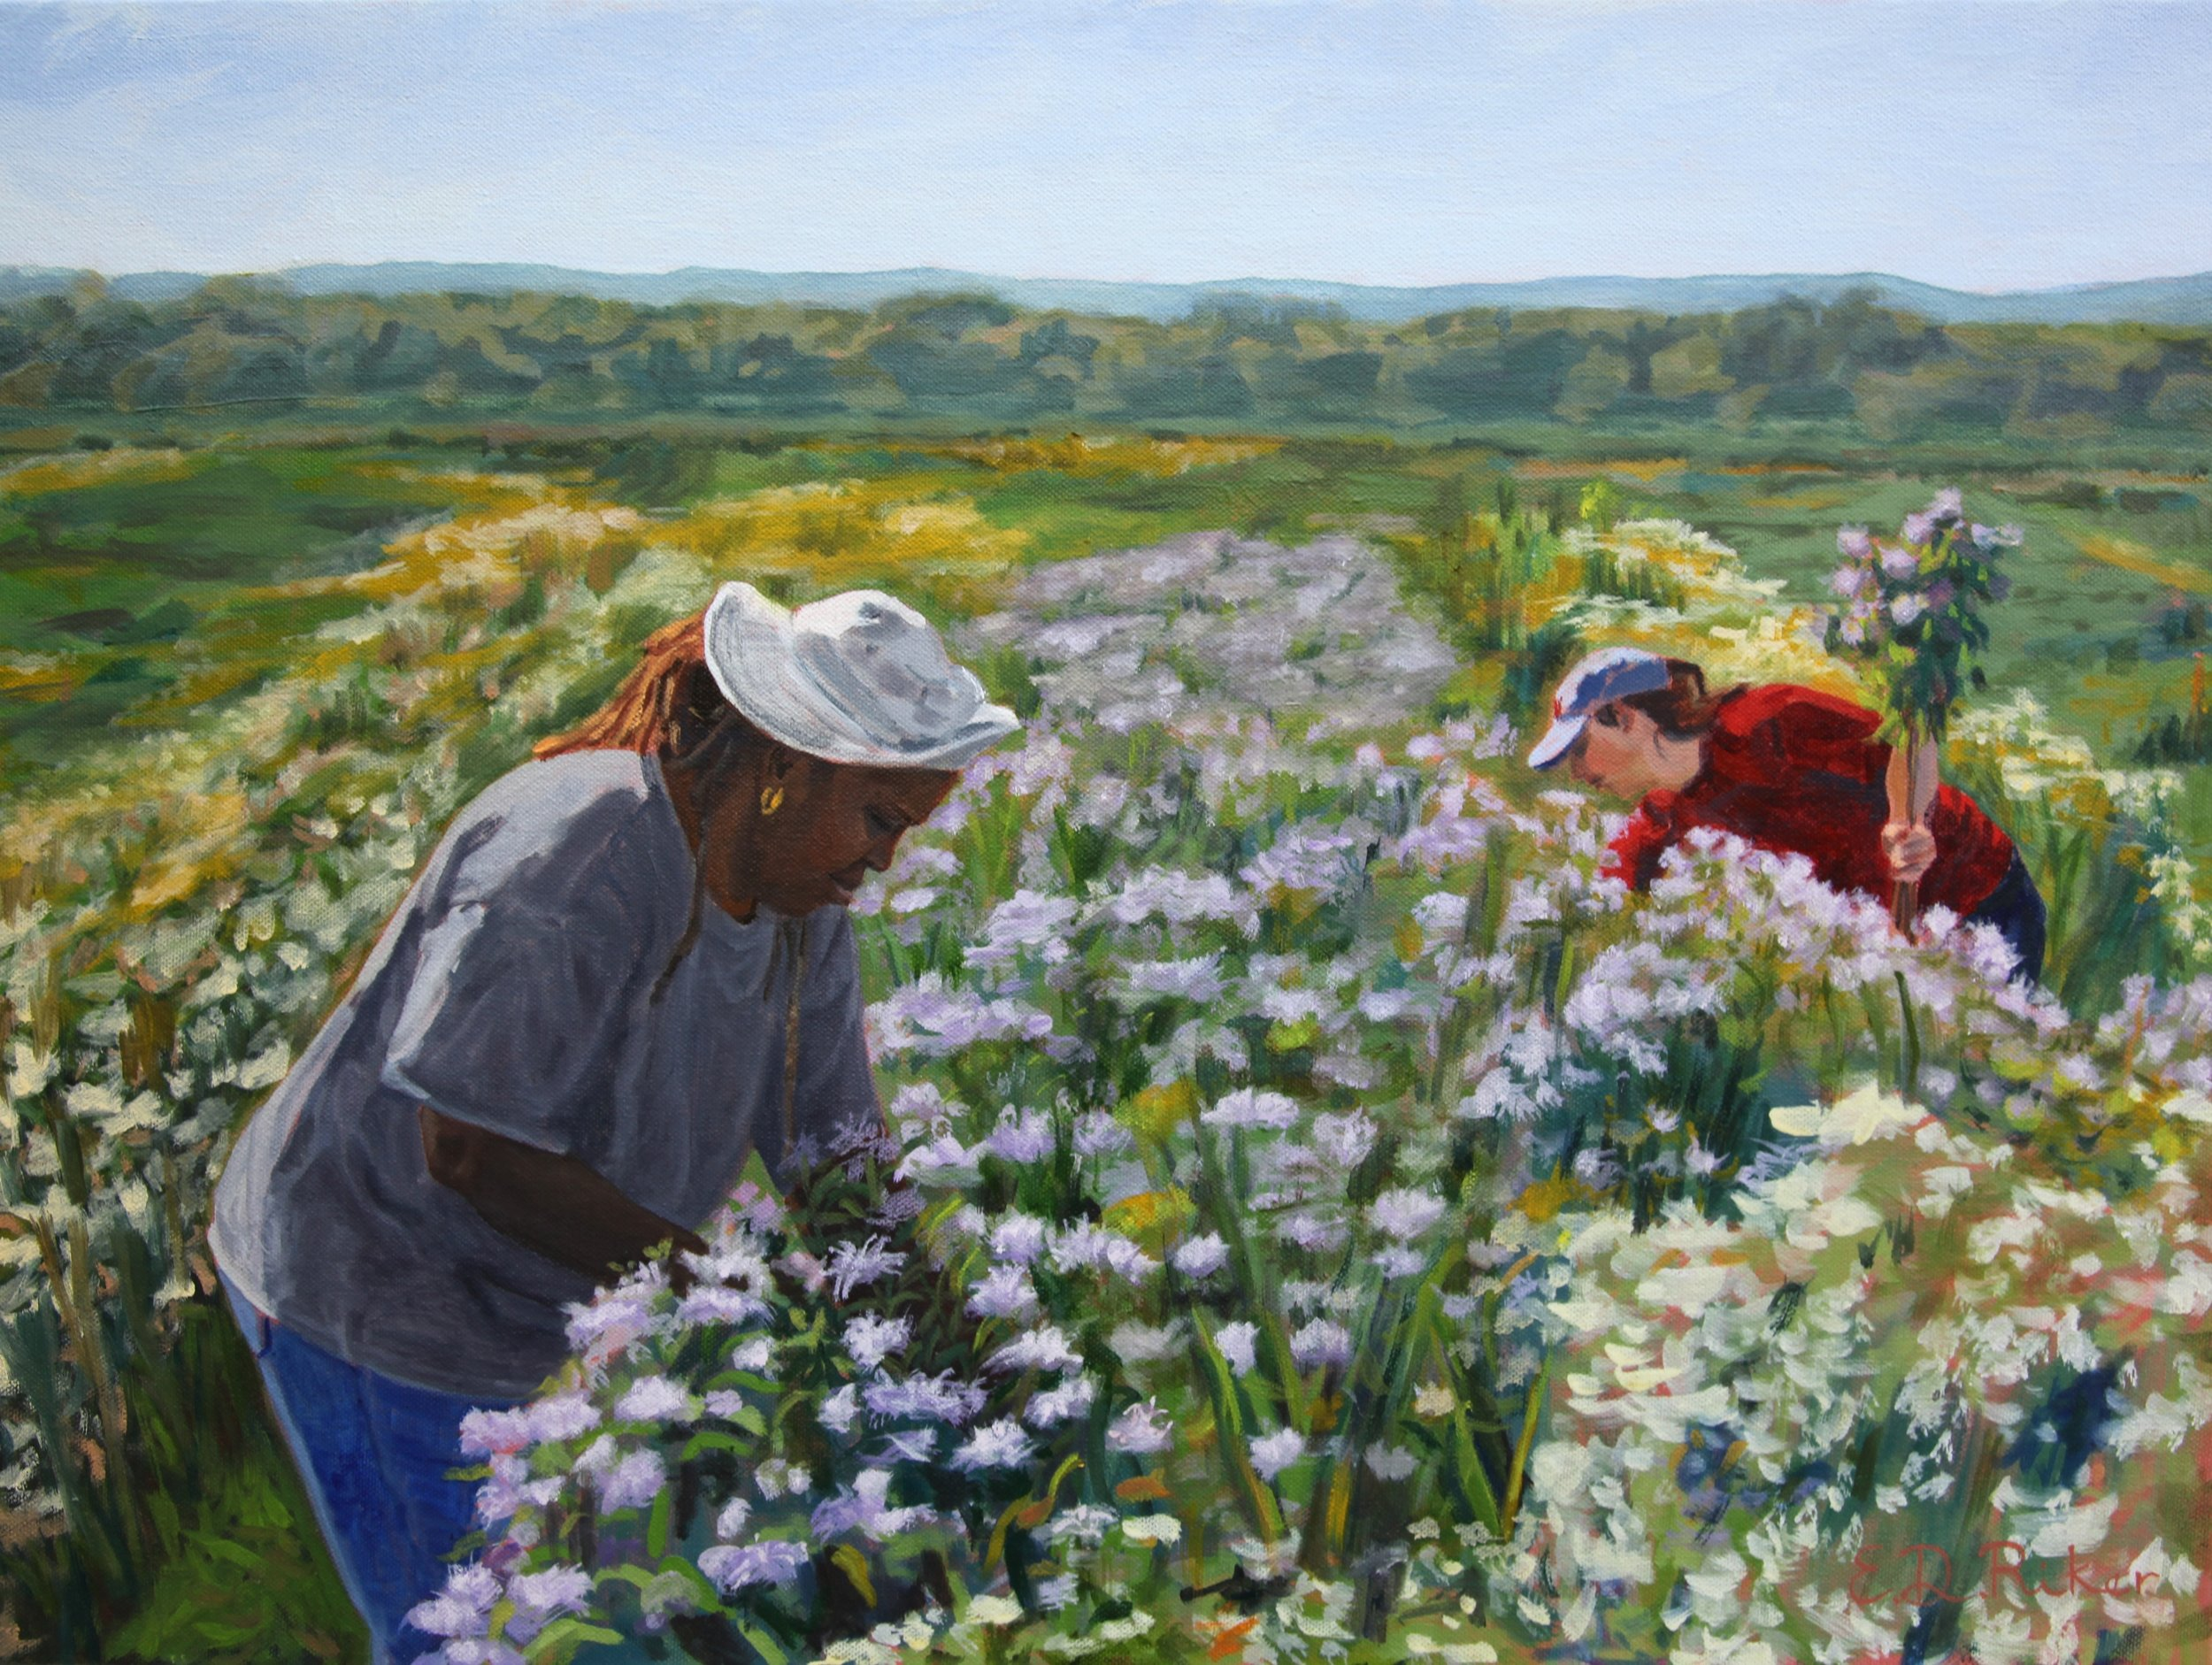 Harvesting Bee Balm